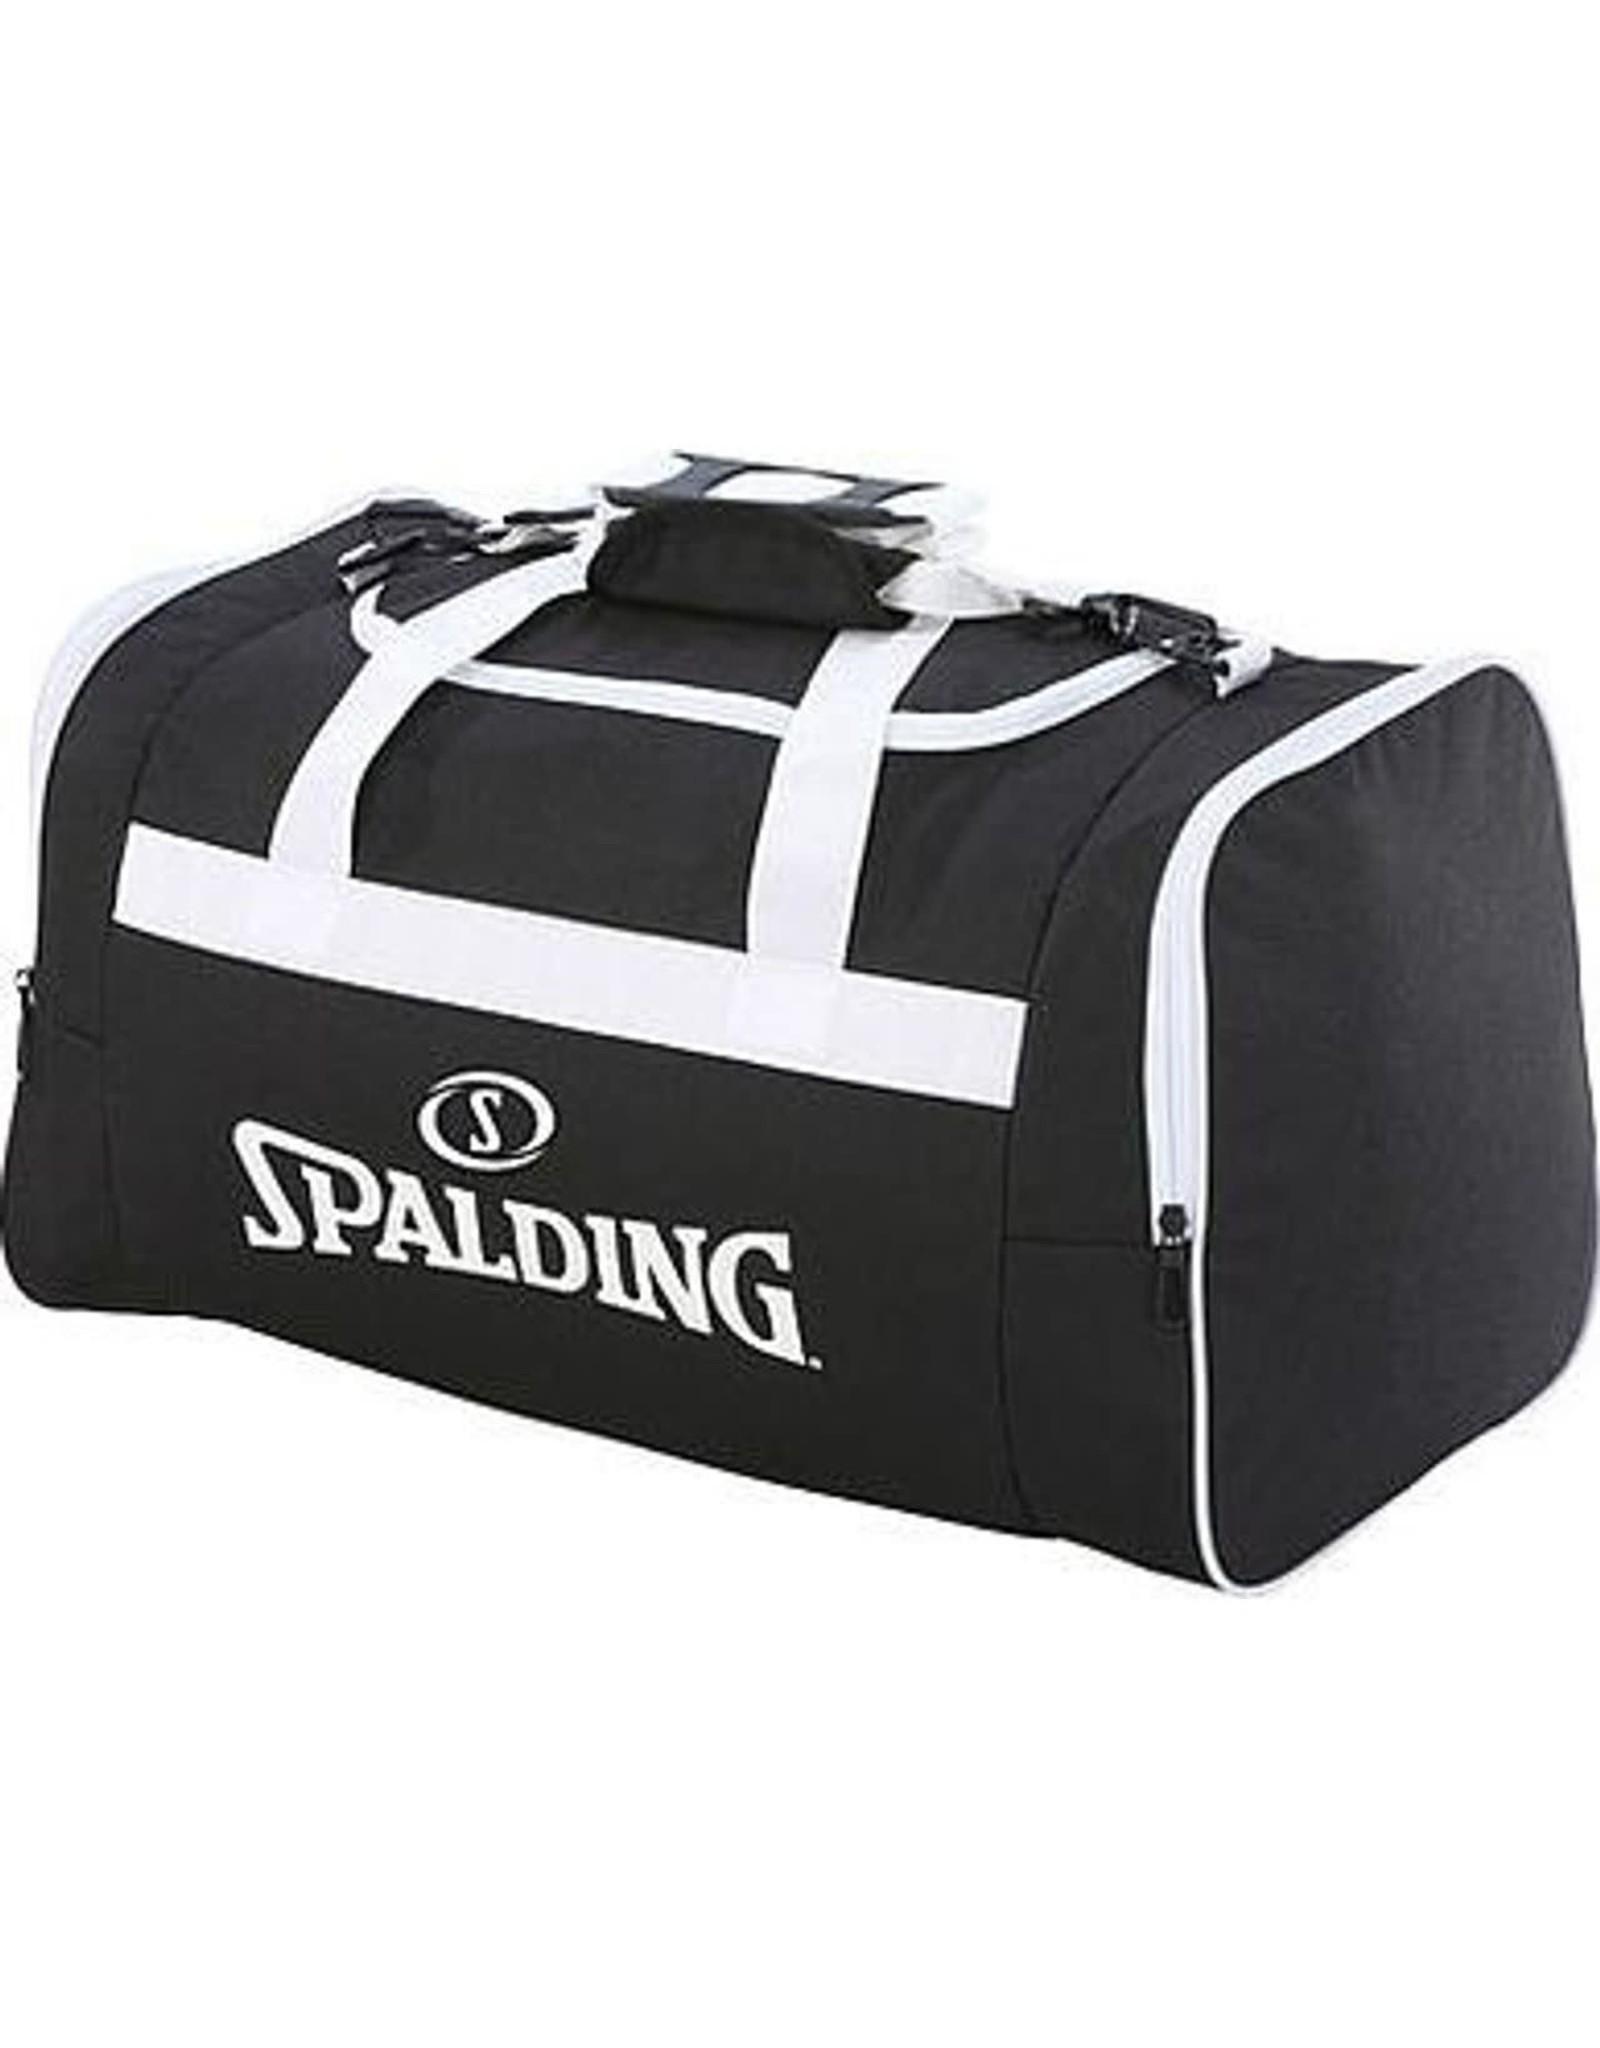 Spalding TEAM BAG MEDIUM BL/W